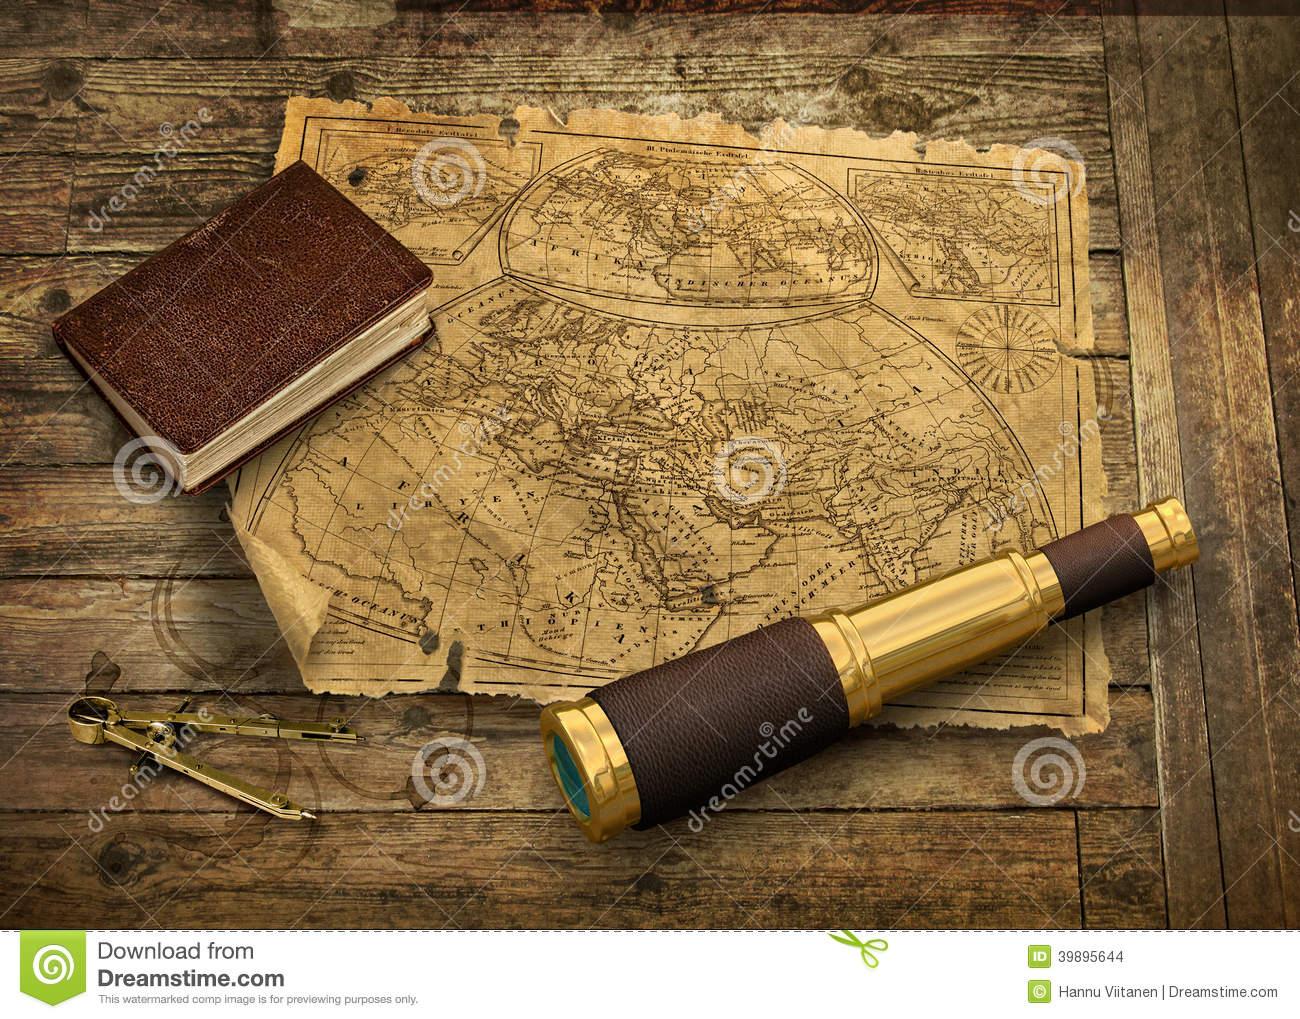 1300x1019px antique nautical map wallpaper wallpapersafari nautical world map wallpaper old world map with telescope 1300x1019 gumiabroncs Gallery